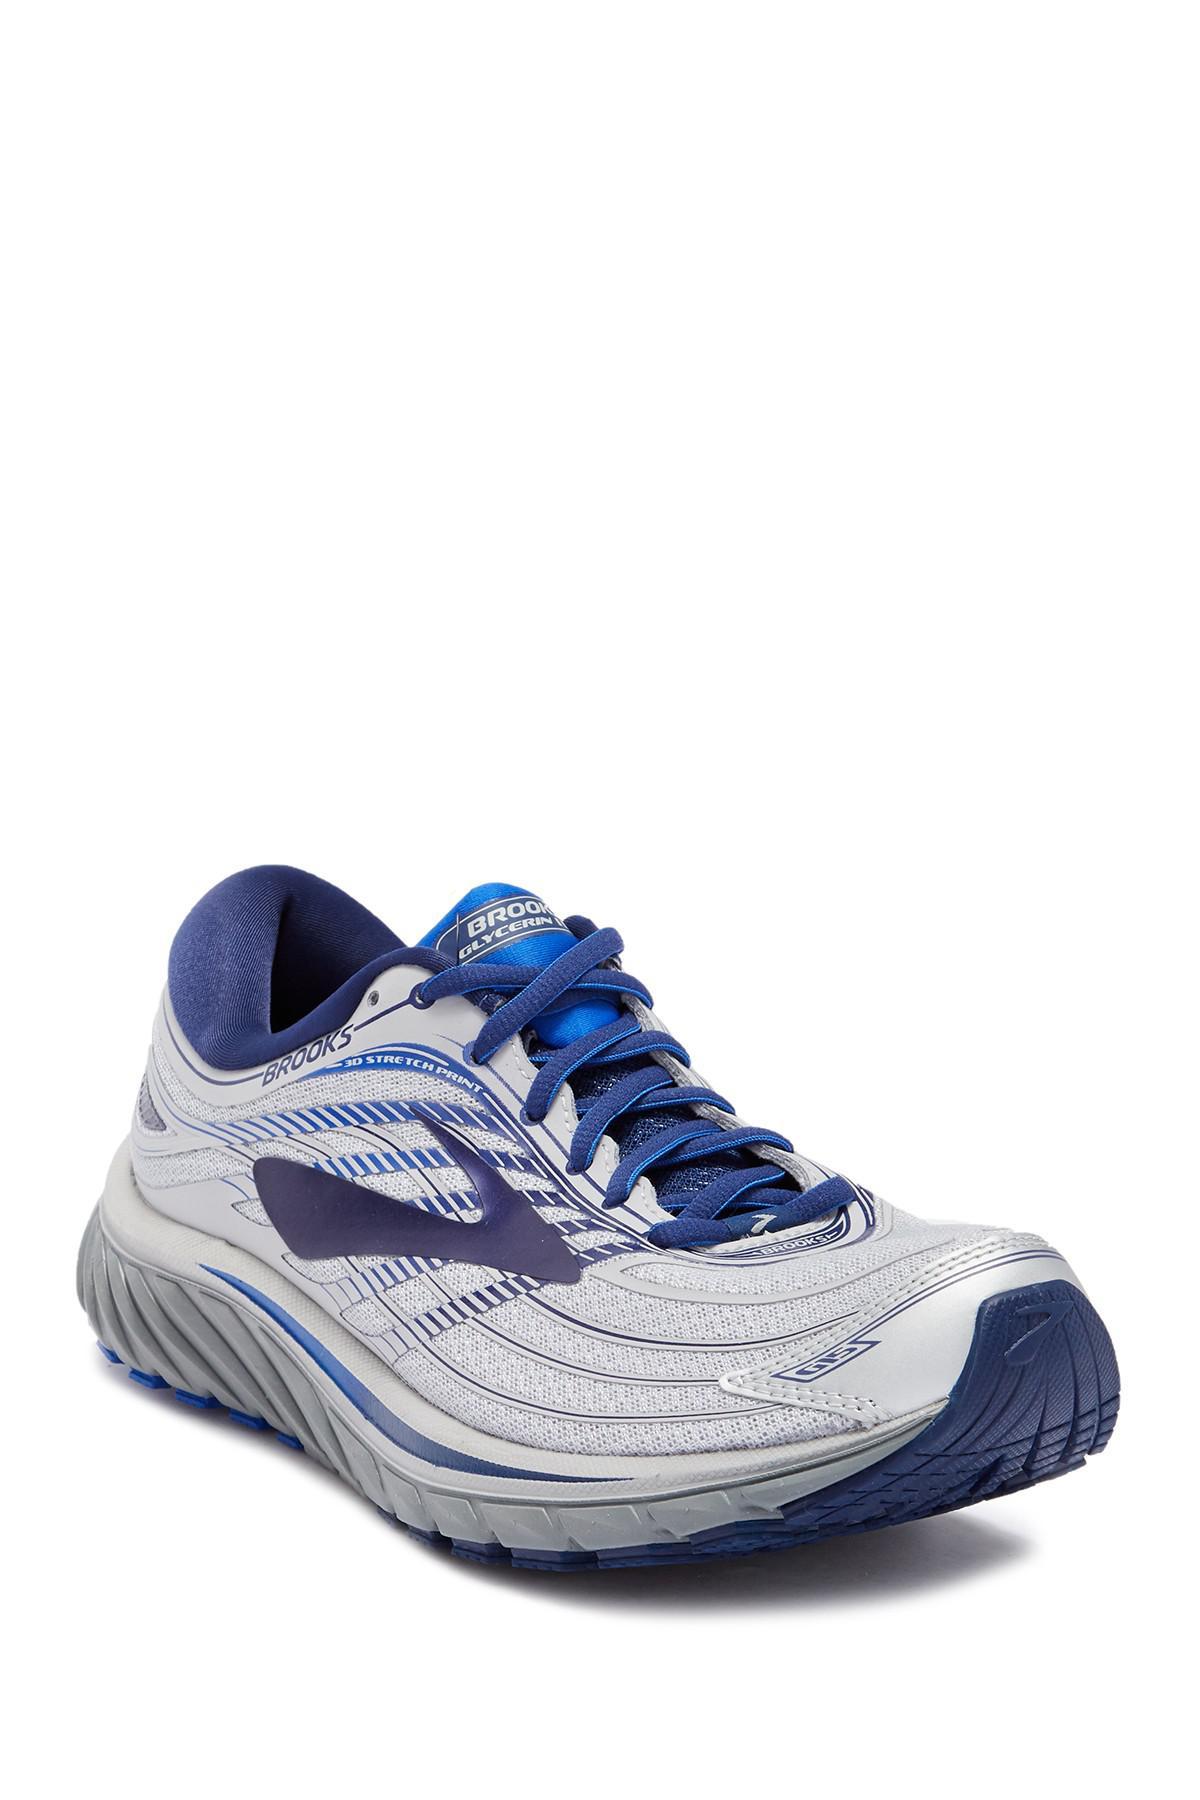 ef81b81bddb69 Lyst - Brooks Glycerin 15 Running Sneaker in Blue for Men